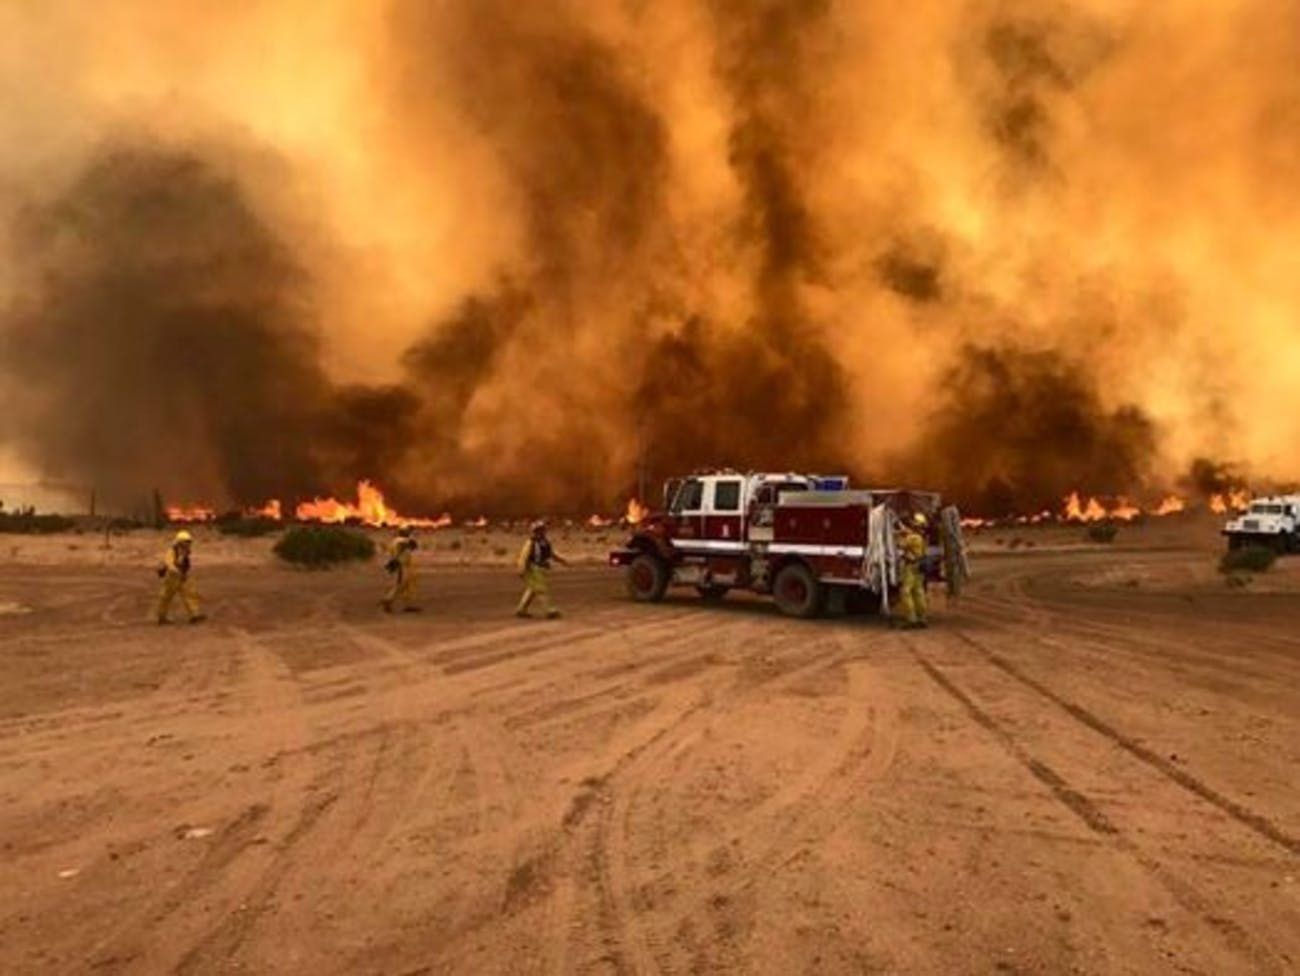 Fires Burn in Nevada Near Tesla's Gigafactory, Maybe from